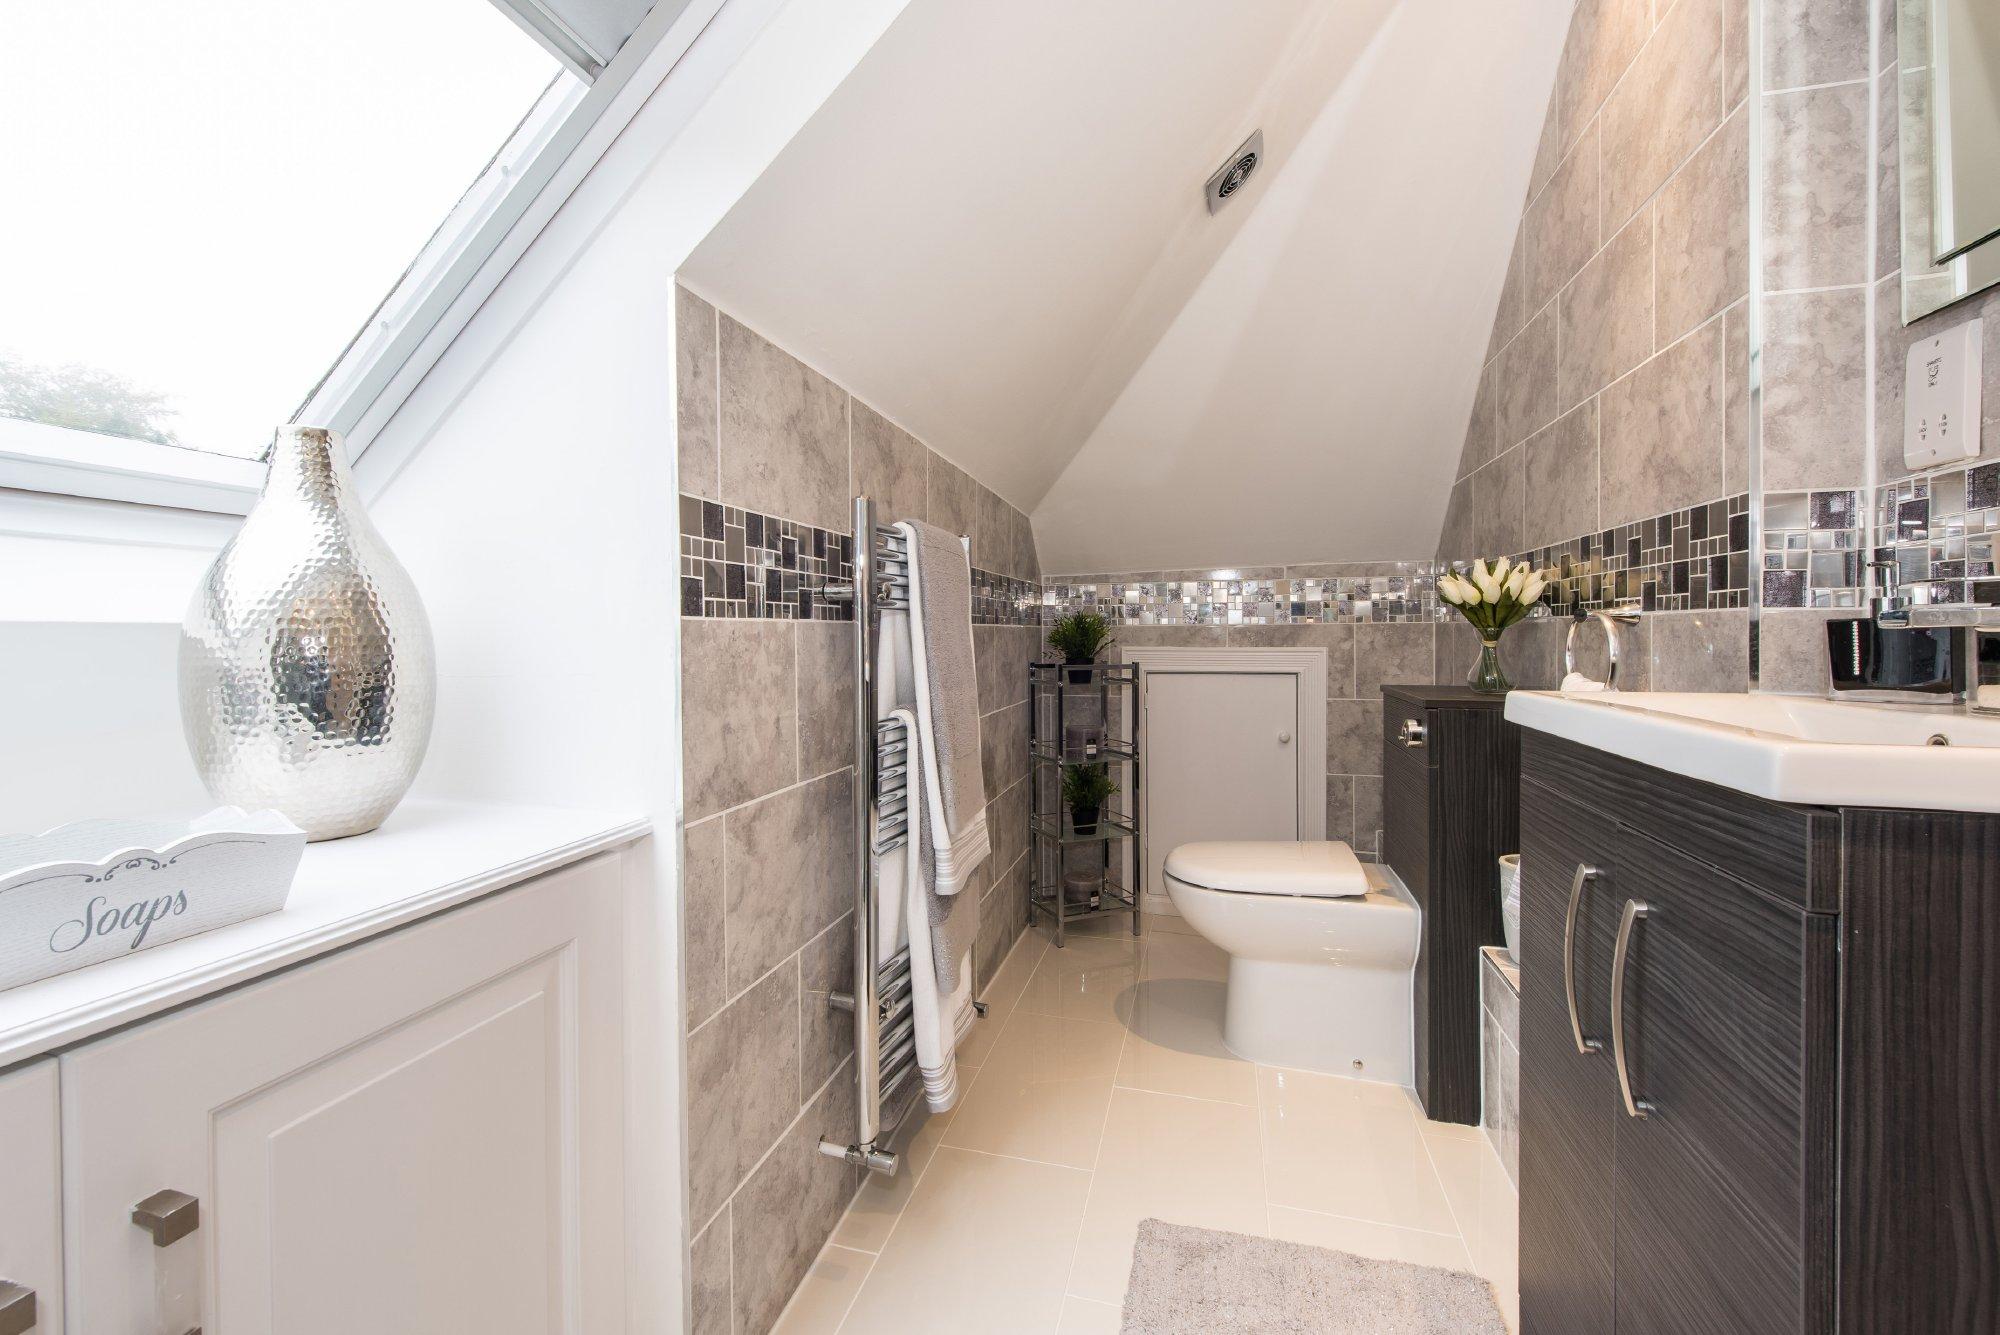 Whiteoak,Bathroom